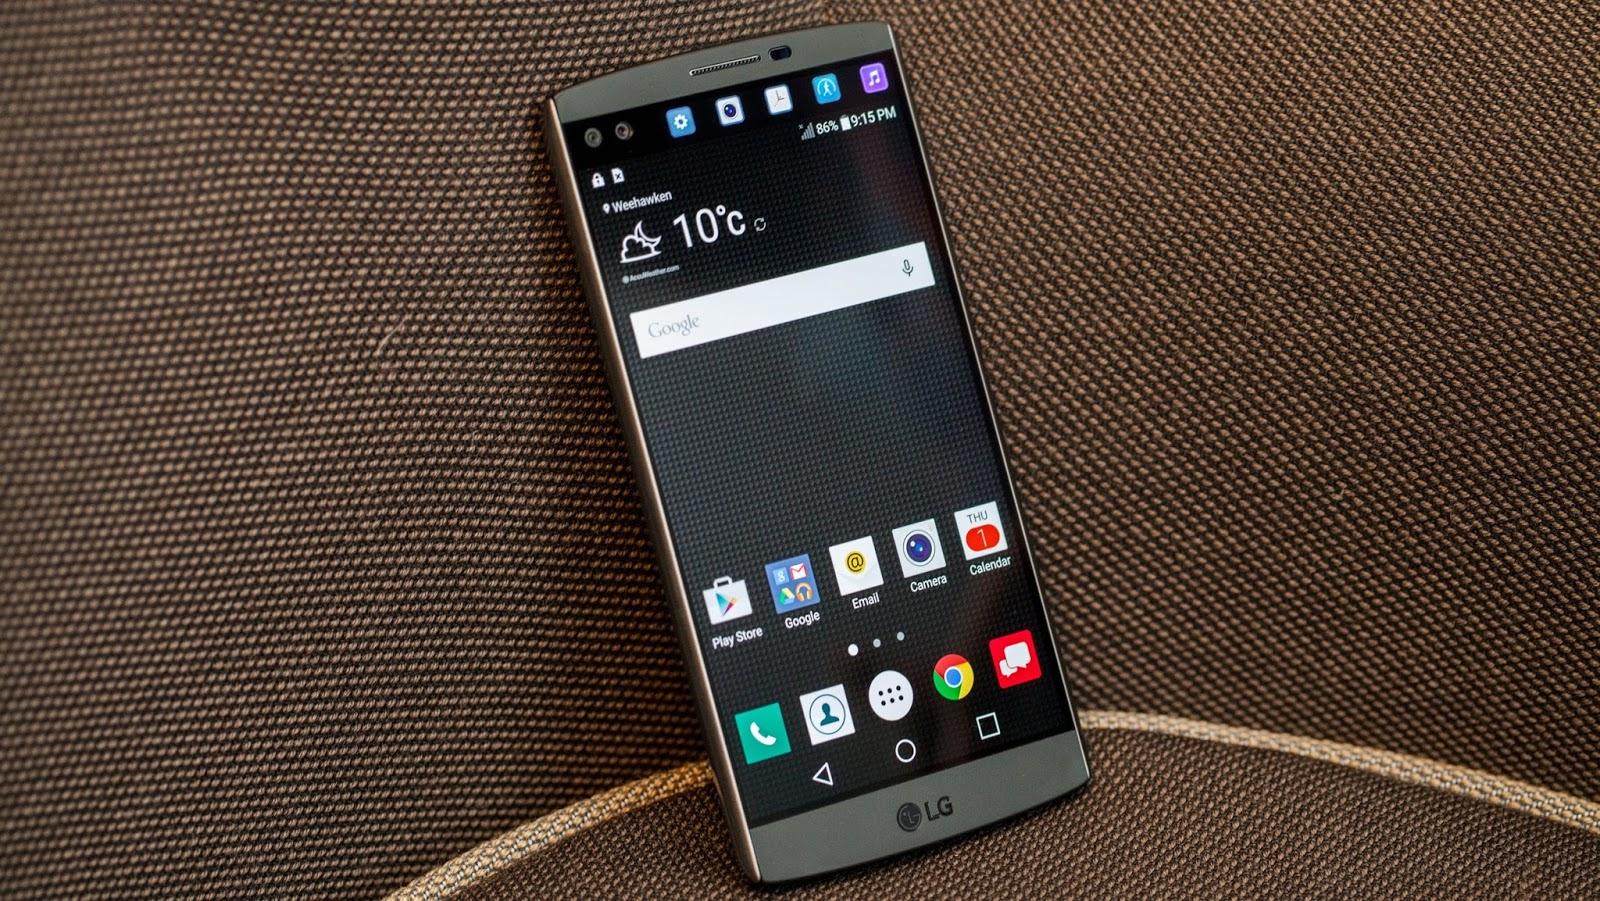 LG G5 - 1000 ile 1500 TL Arası Telefonlar